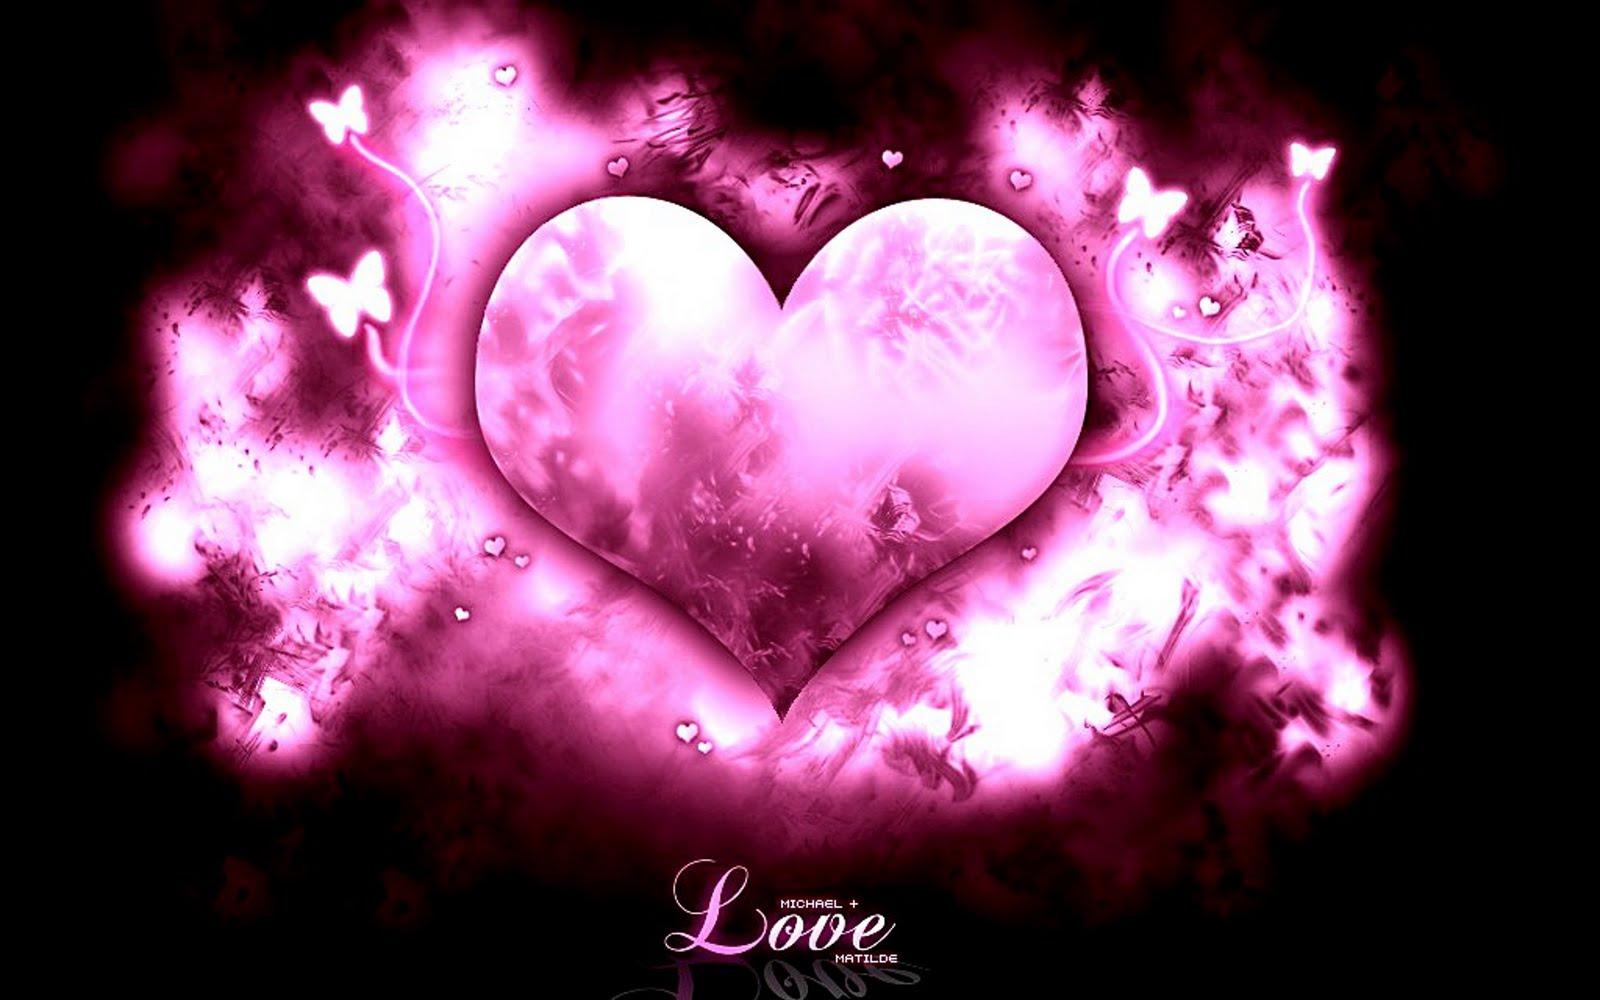 http://1.bp.blogspot.com/_Ym3du2sG3R4/TJ-kOyxYhUI/AAAAAAAAC24/LJJtTfnbSFk/s1600/Pink-Heart-wallpaper.jpg